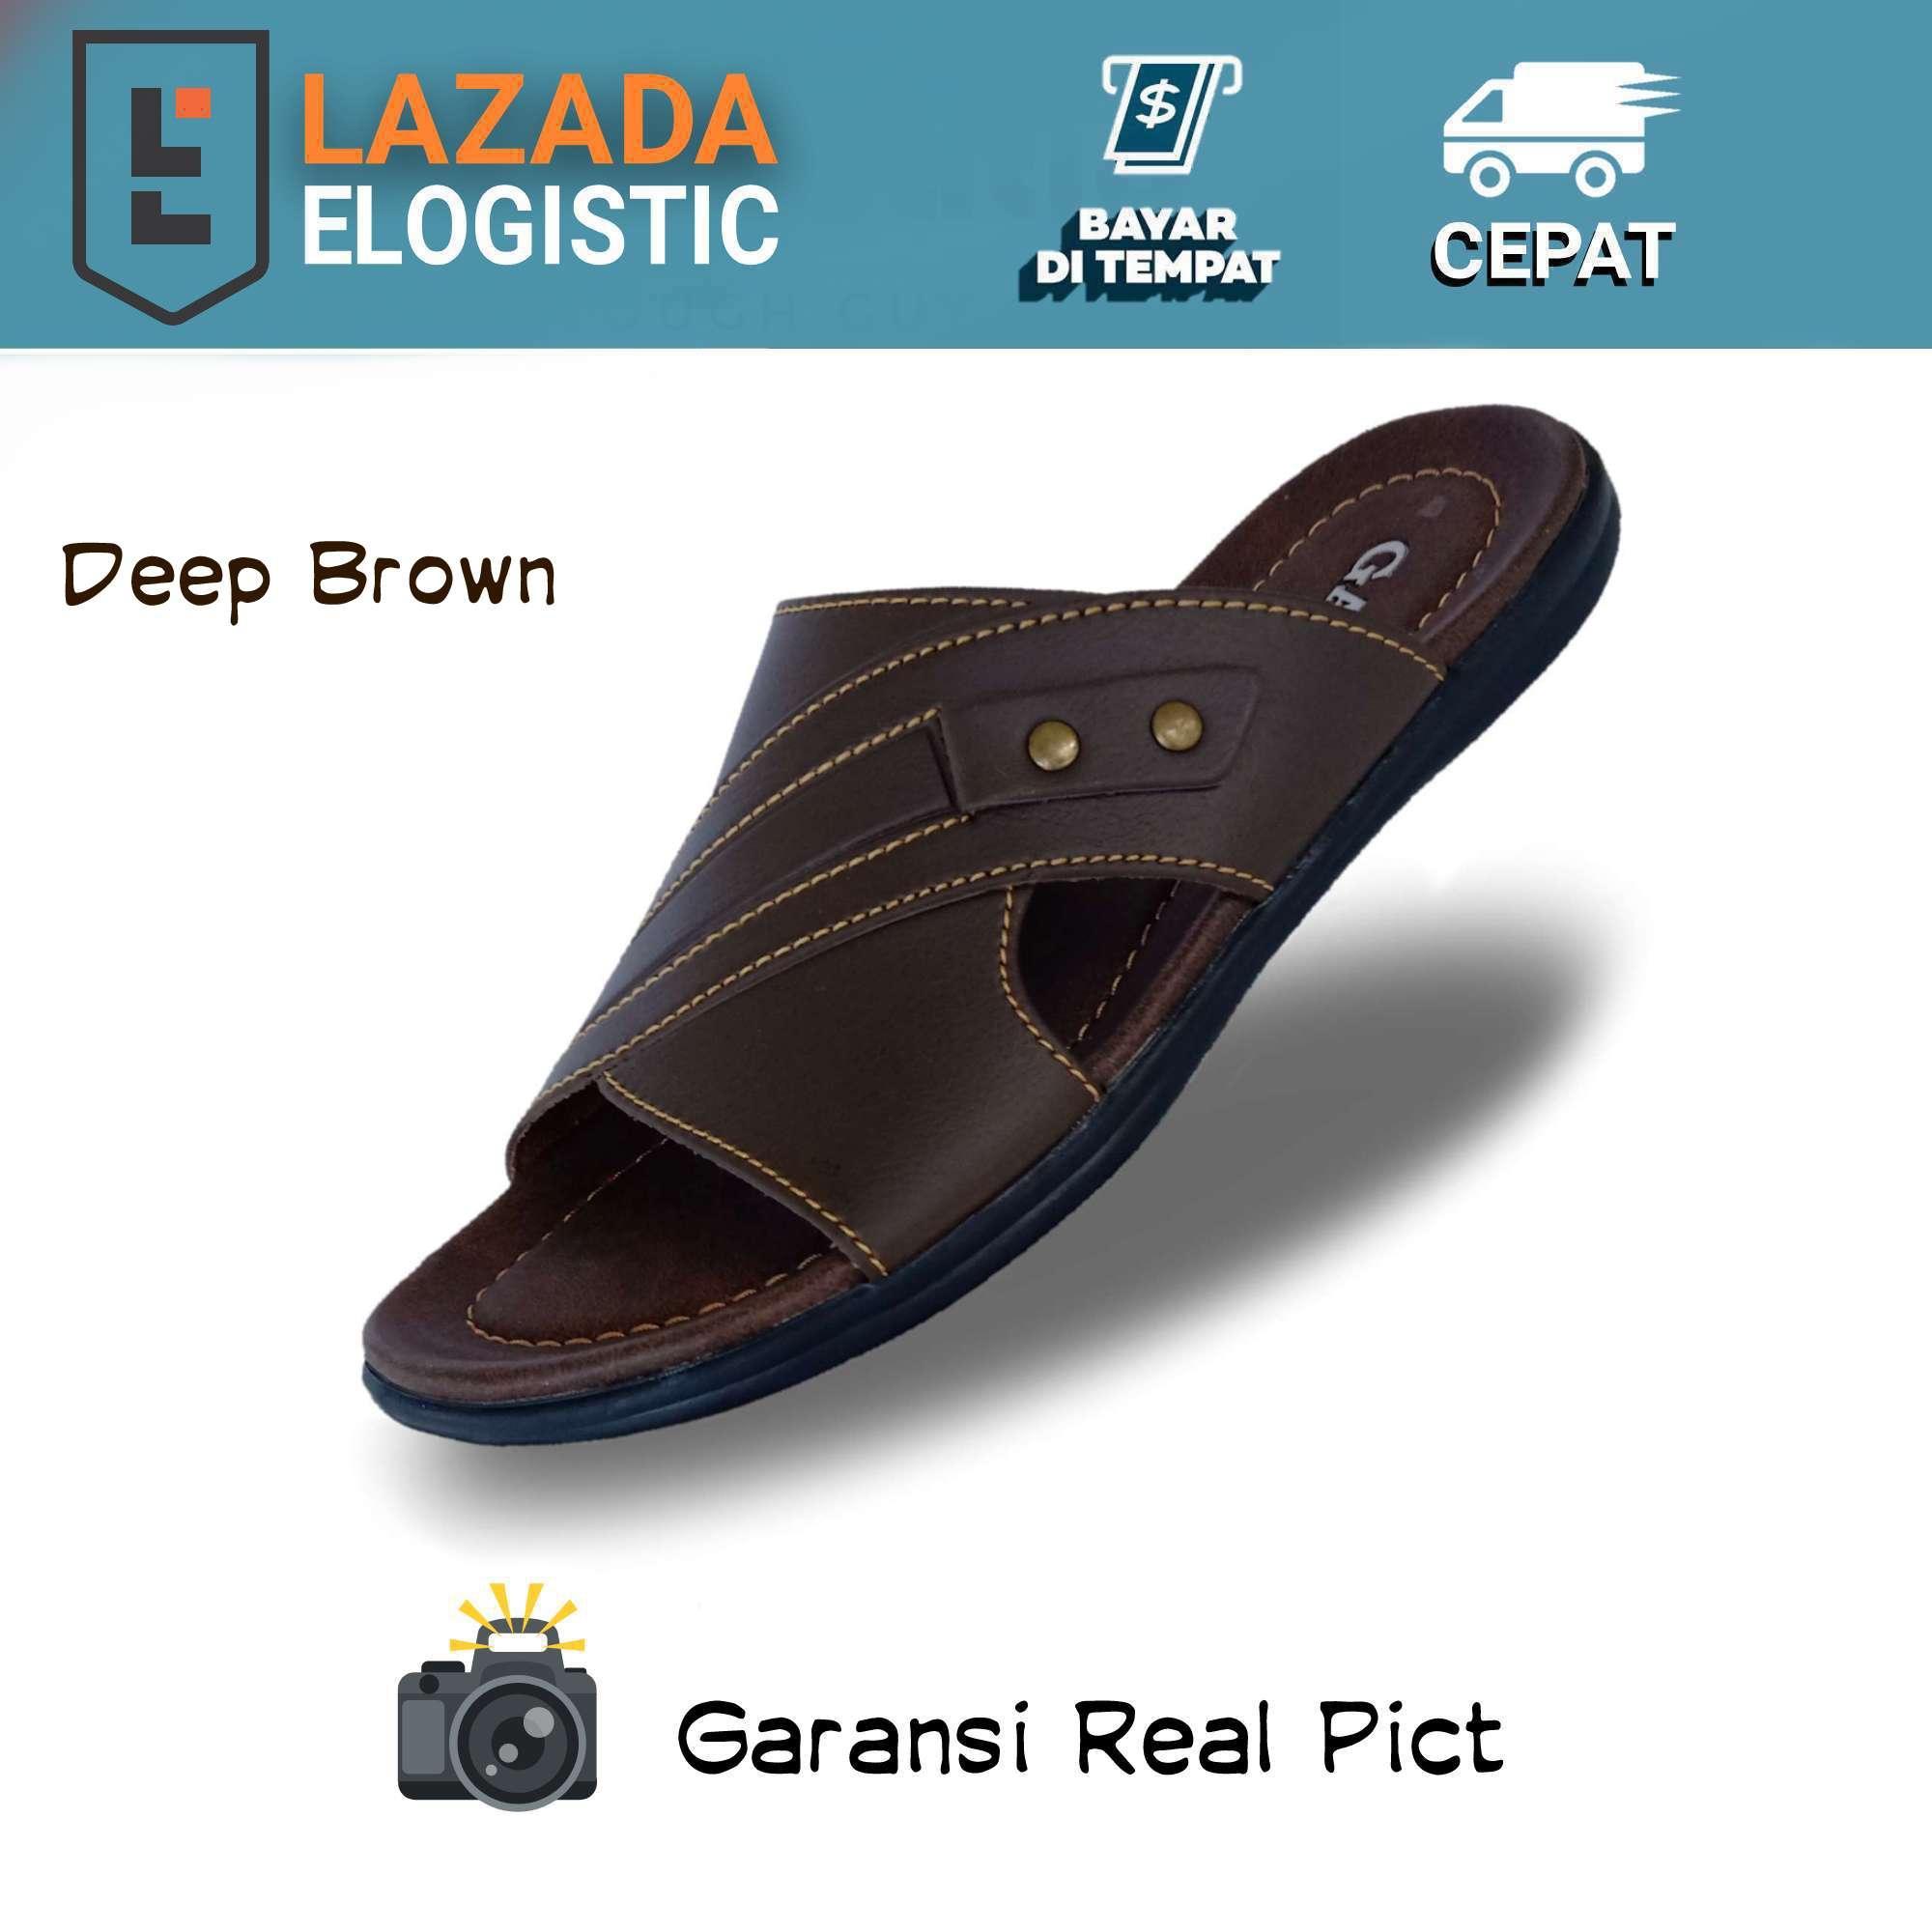 [gatio] sandal kulit pria / sandal pria kulit slop selop / sandal kulit pria kulit casual / sandal kulit casual / sandal pria kulit  / sandal  – bb43